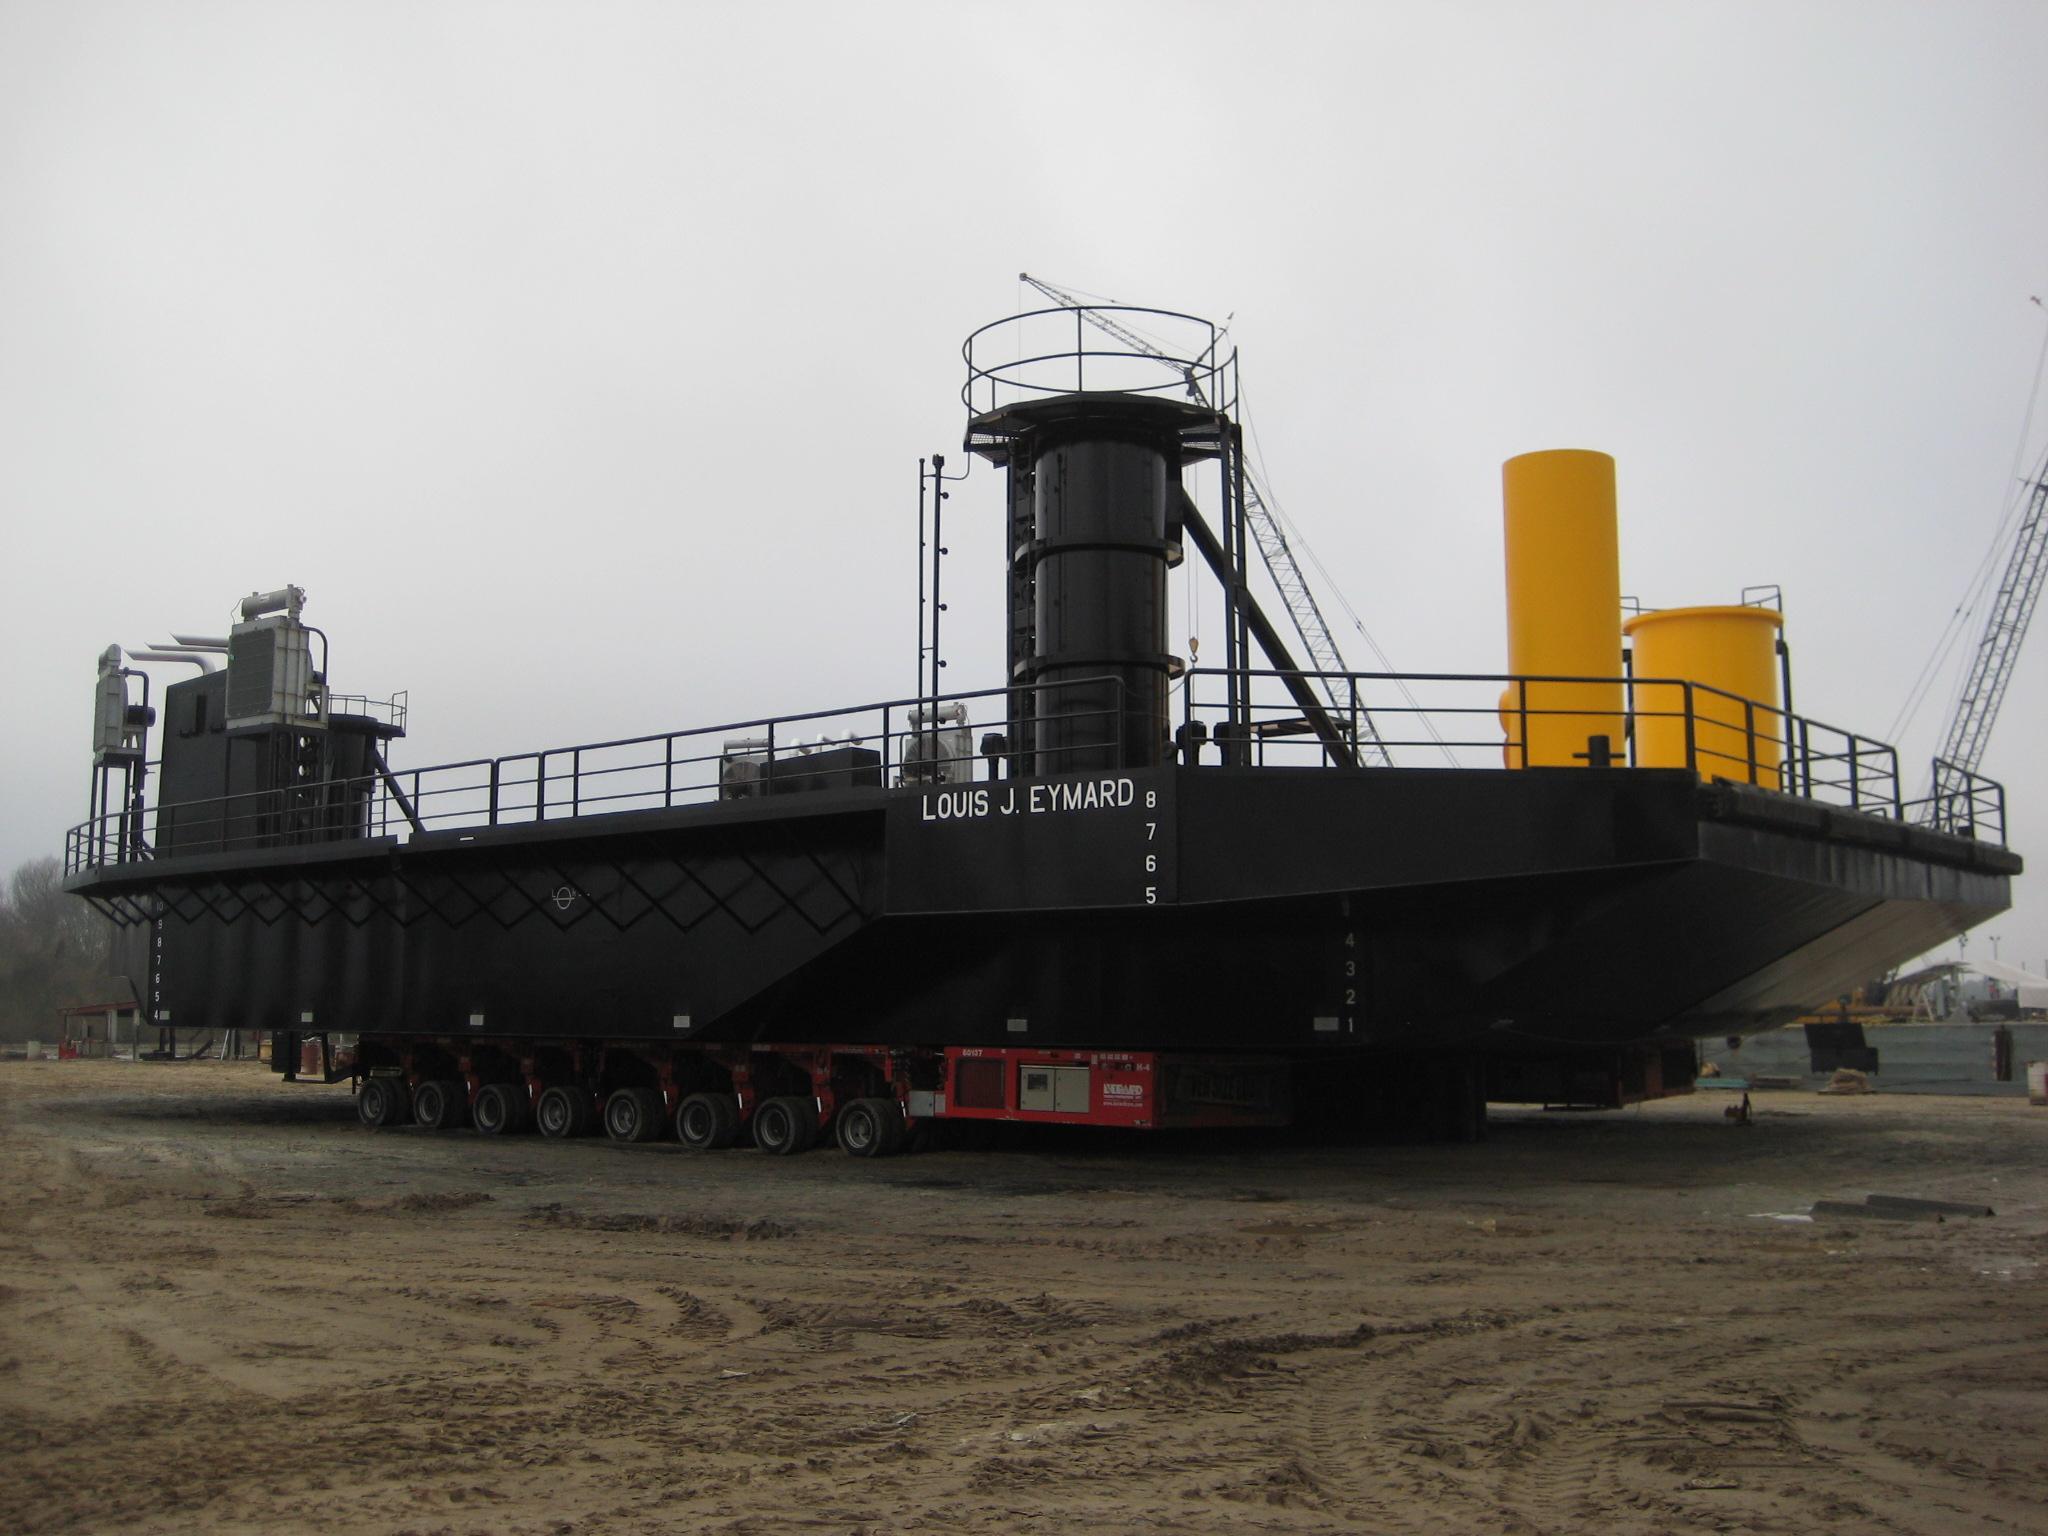 Class 175 Liftboat Hull